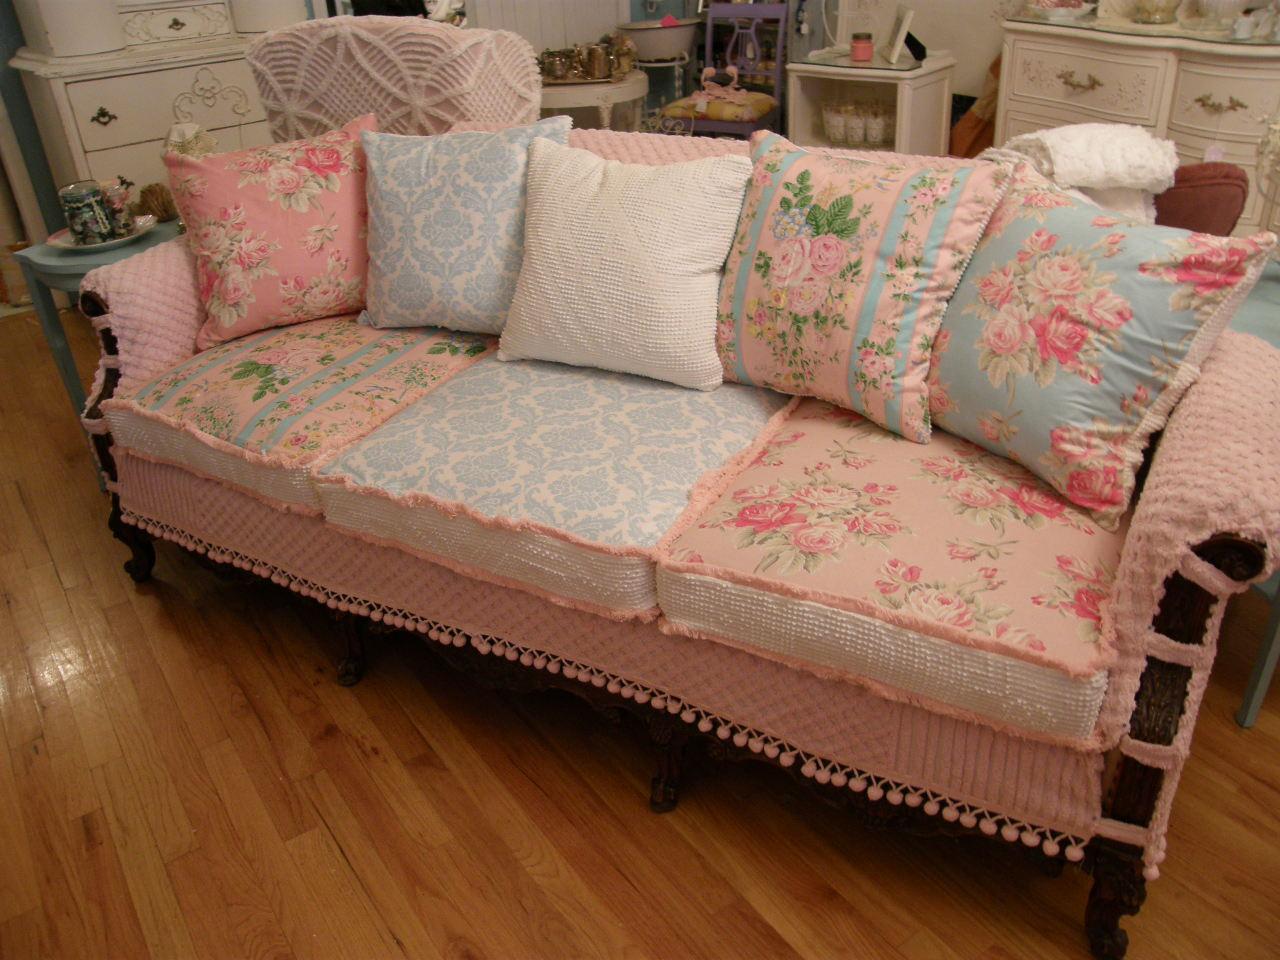 Vintage Chic Furniture Schenectady NY: my vintage chenille ...